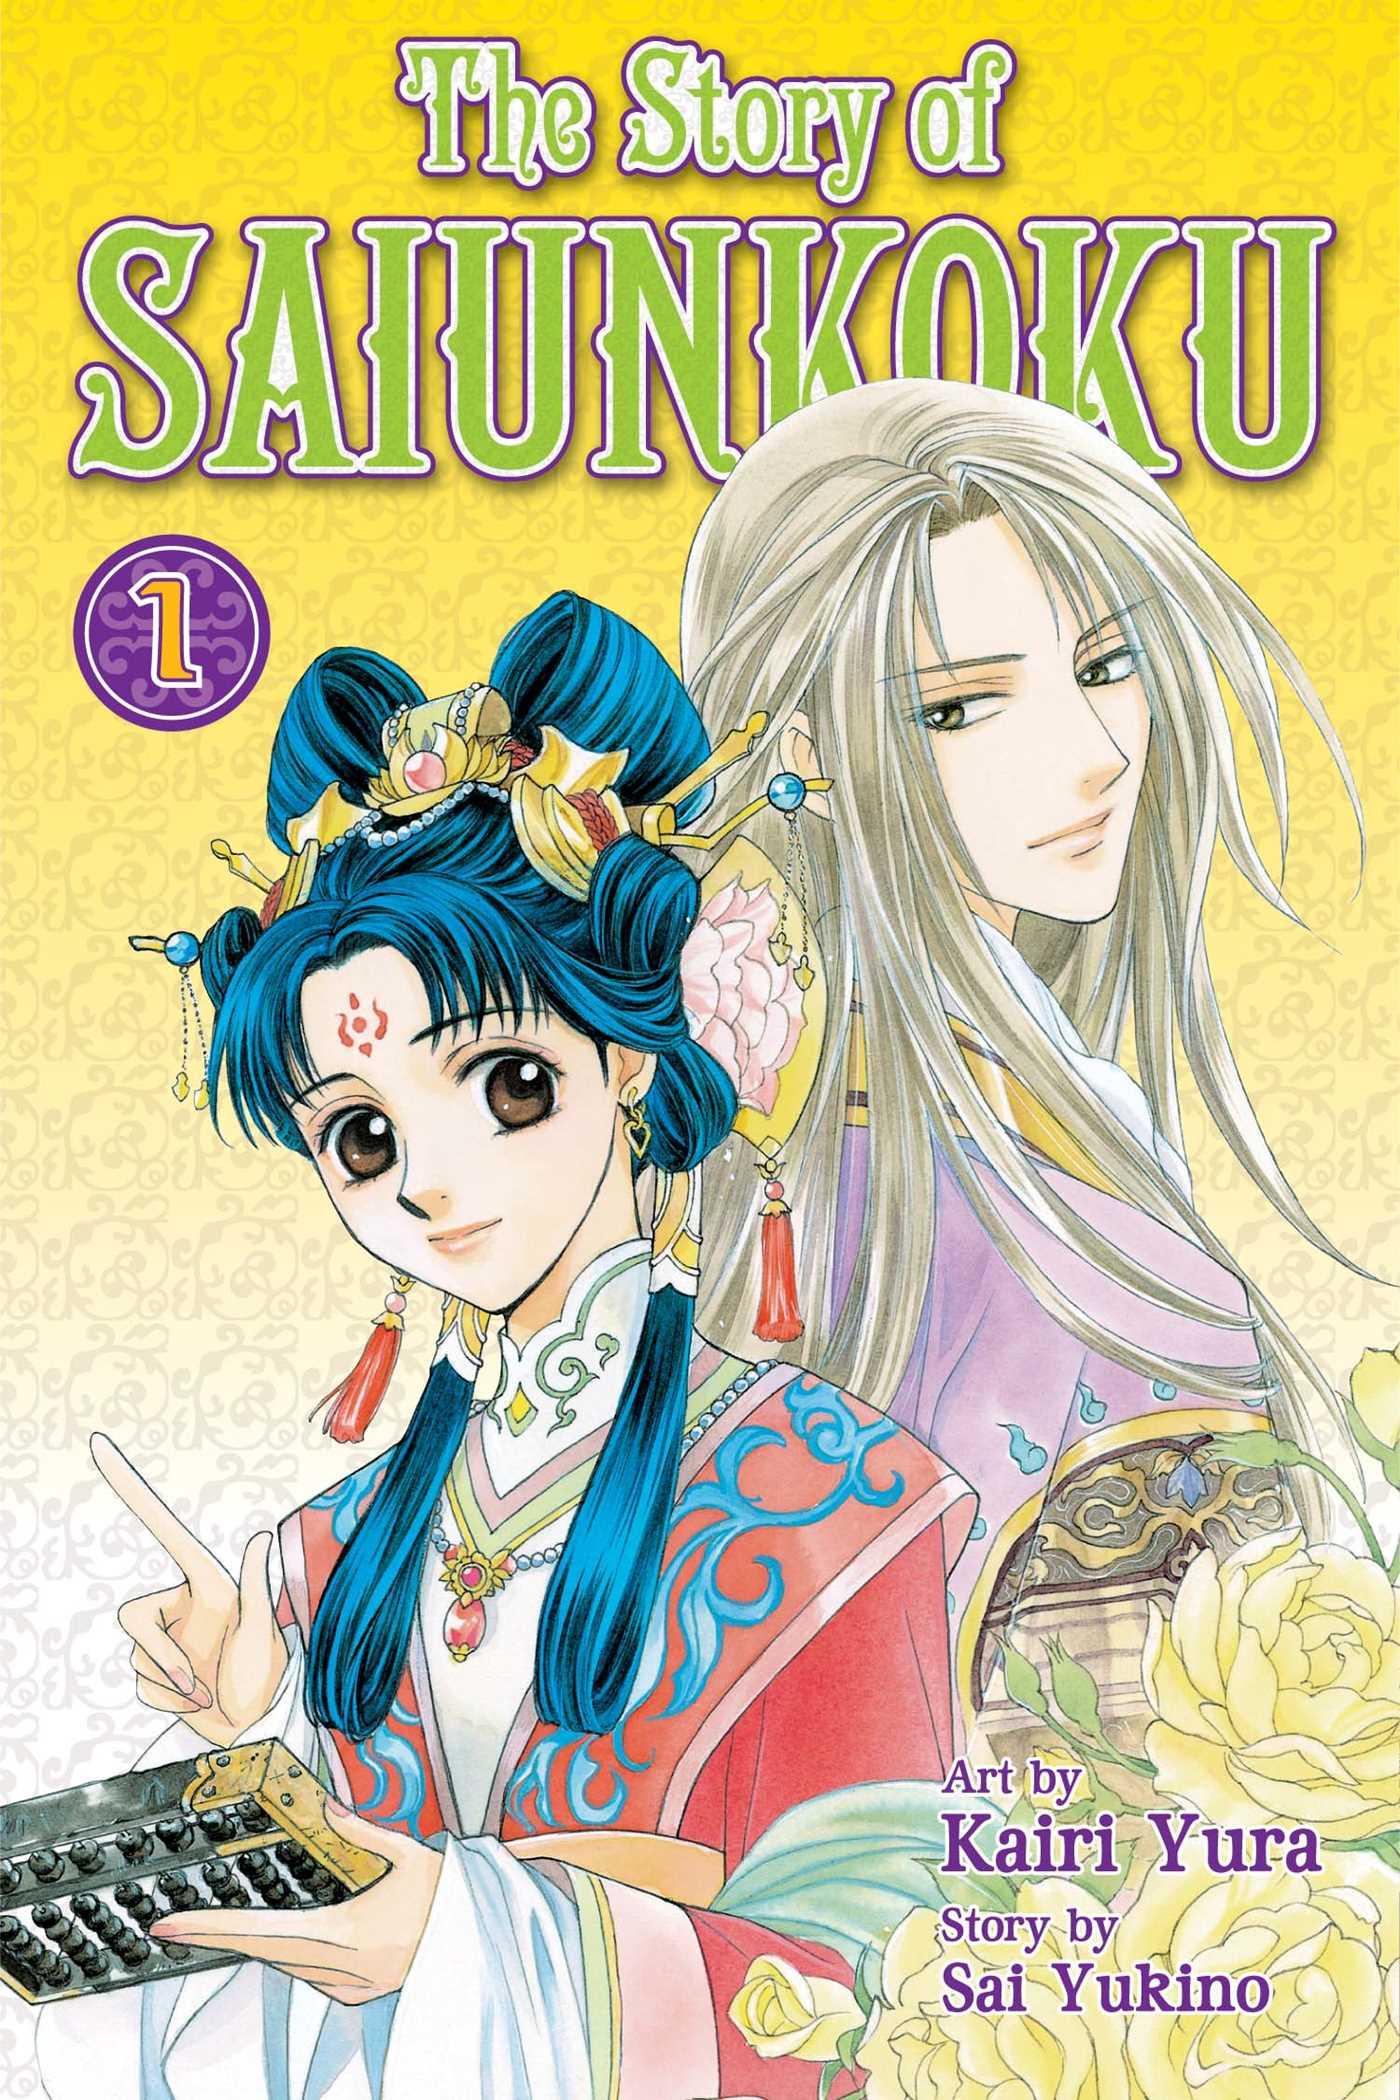 The story of saiunkoku vol 1 9781421538341 hr